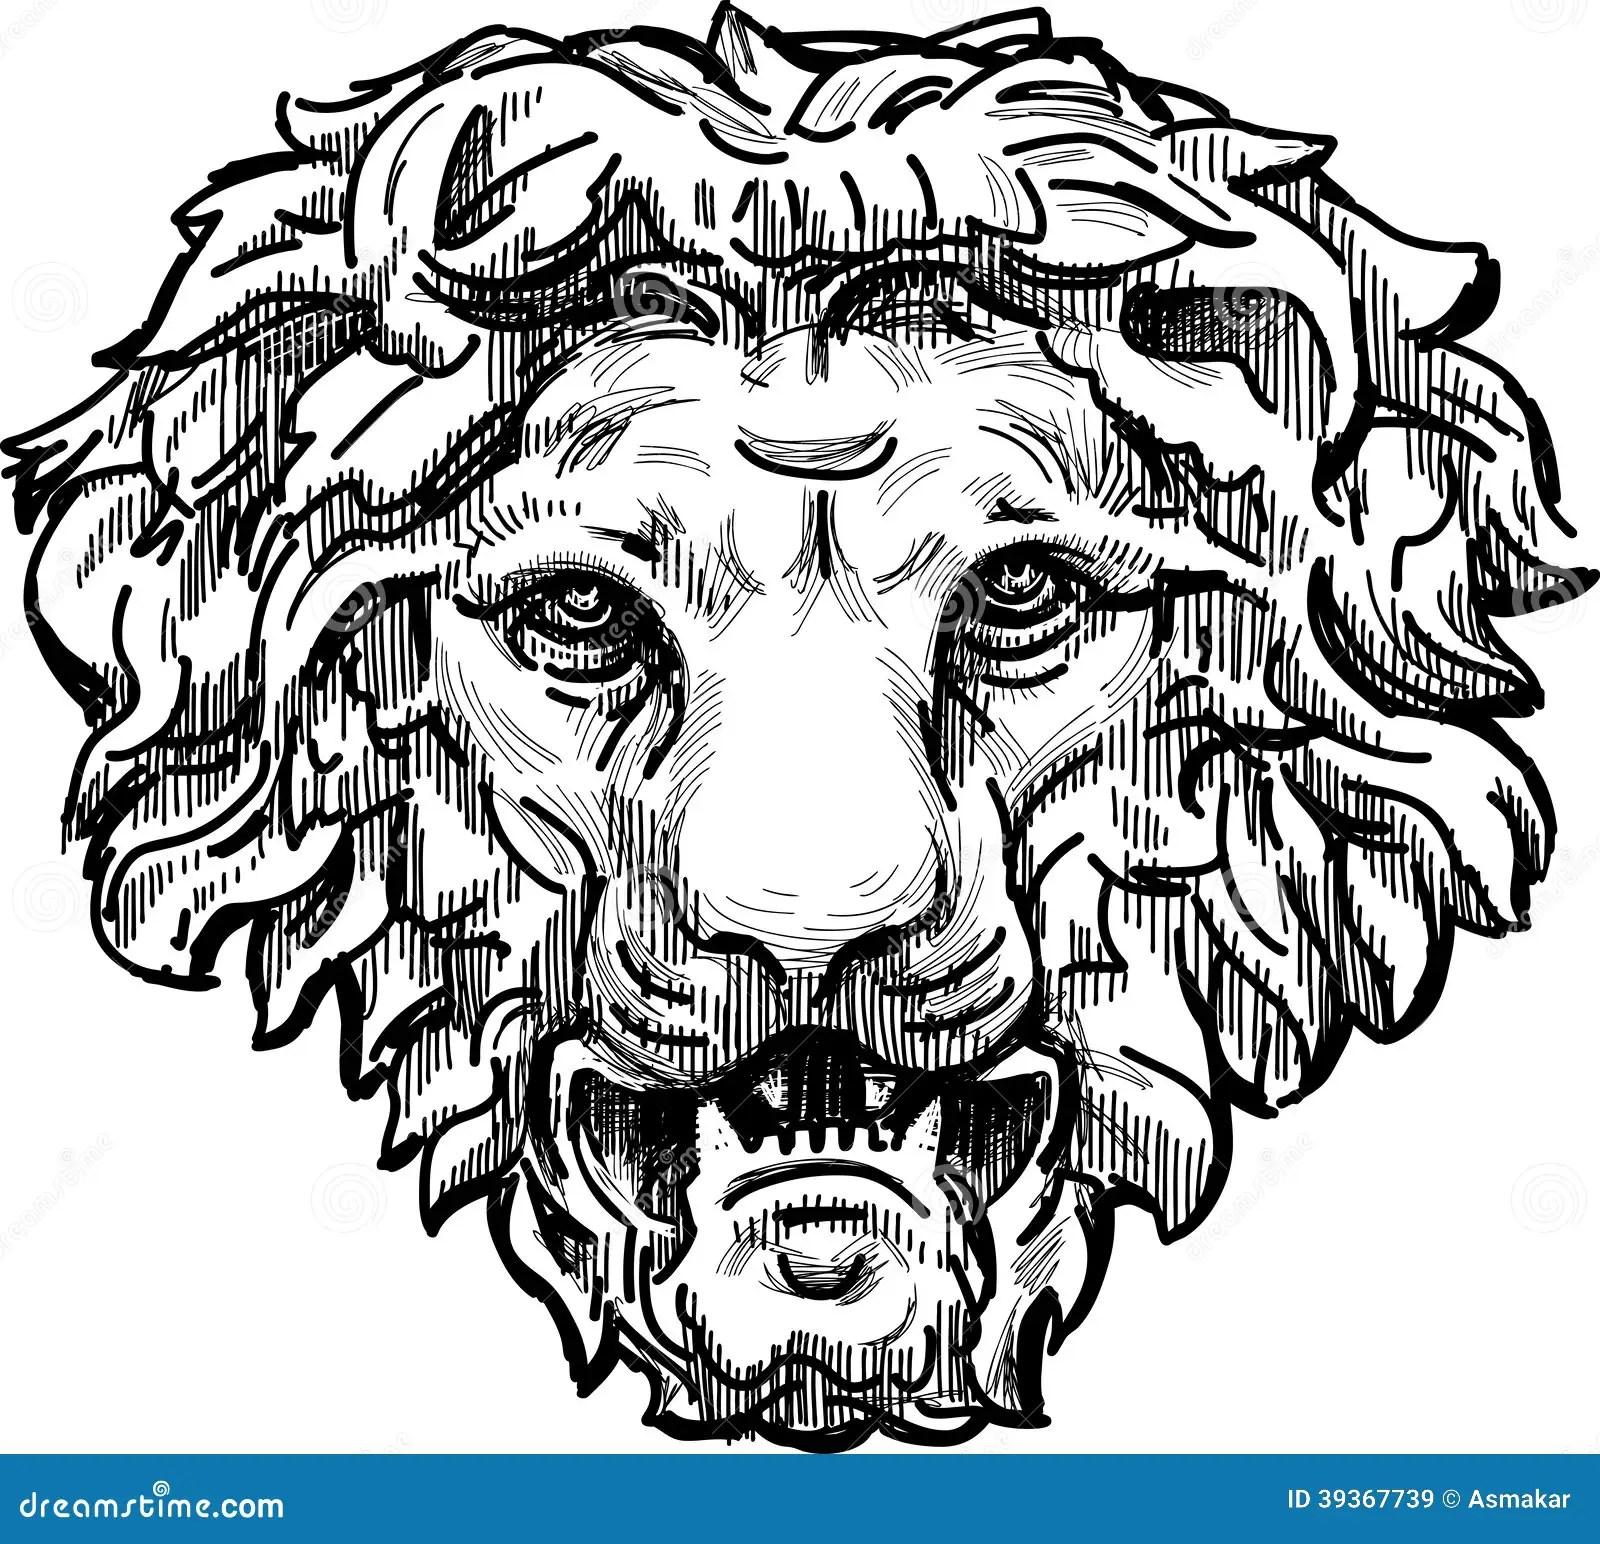 Snarling lion head stock vector. Illustration of sketch